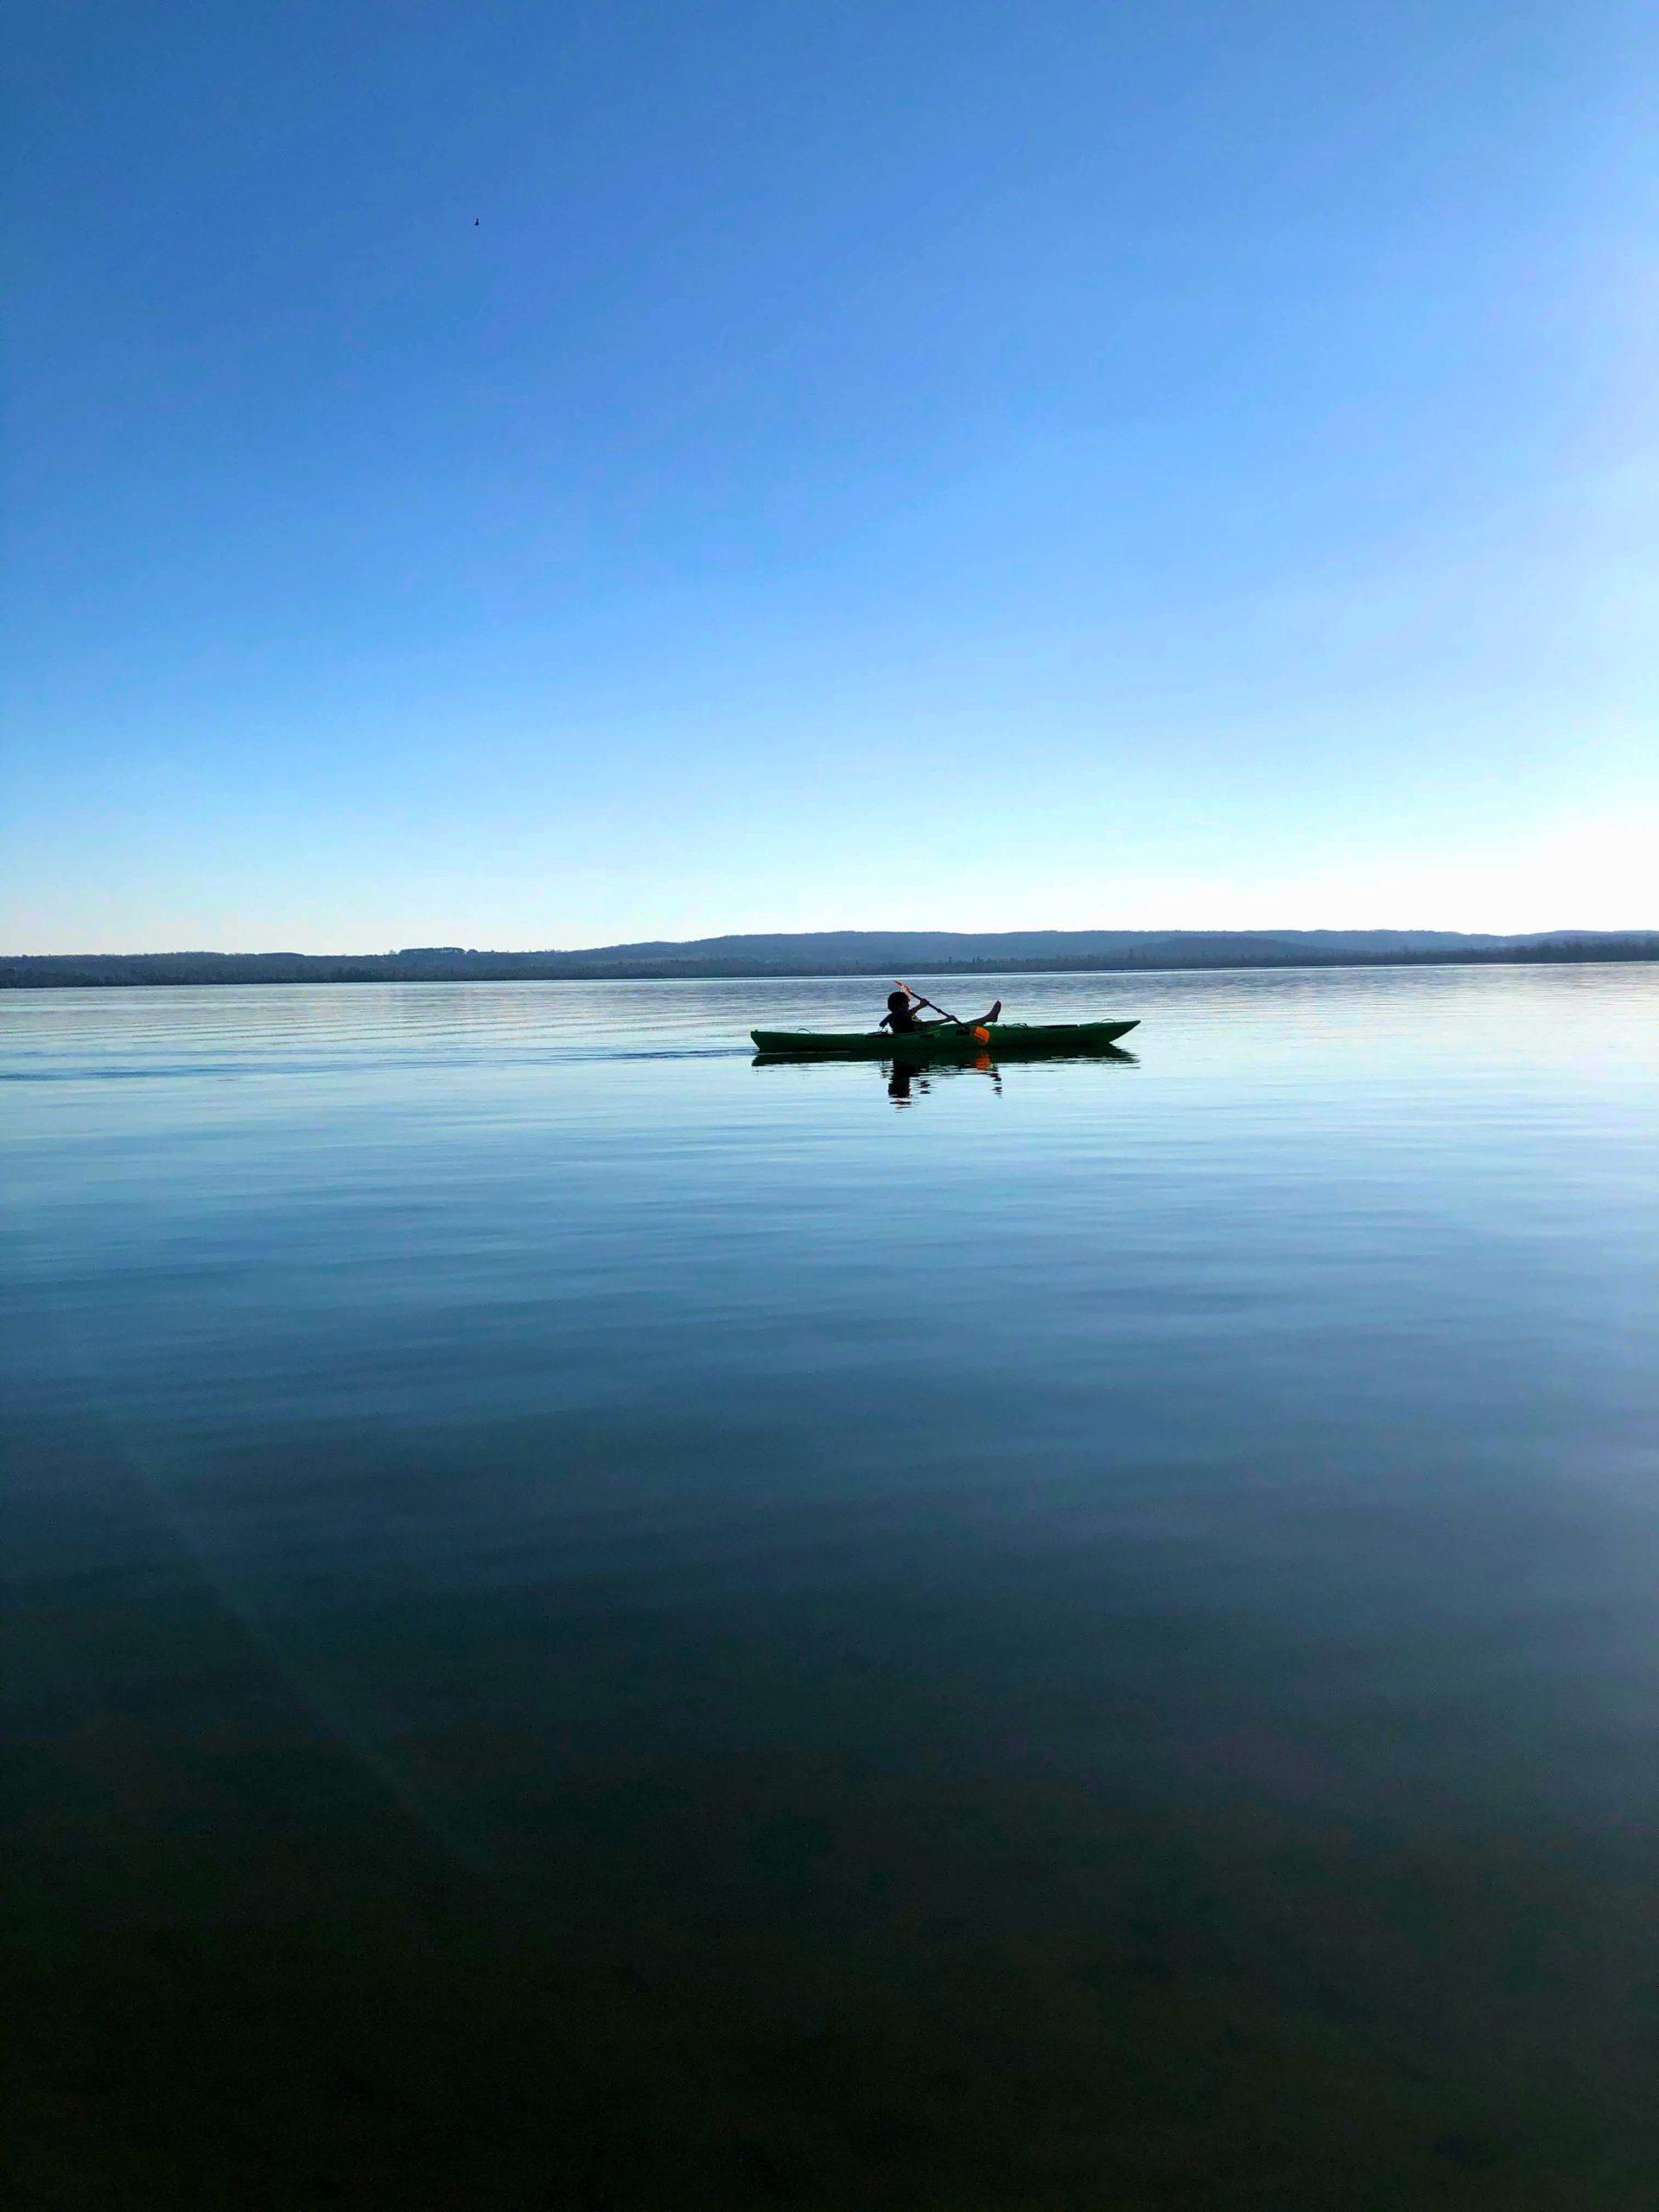 person kayaking in the lake